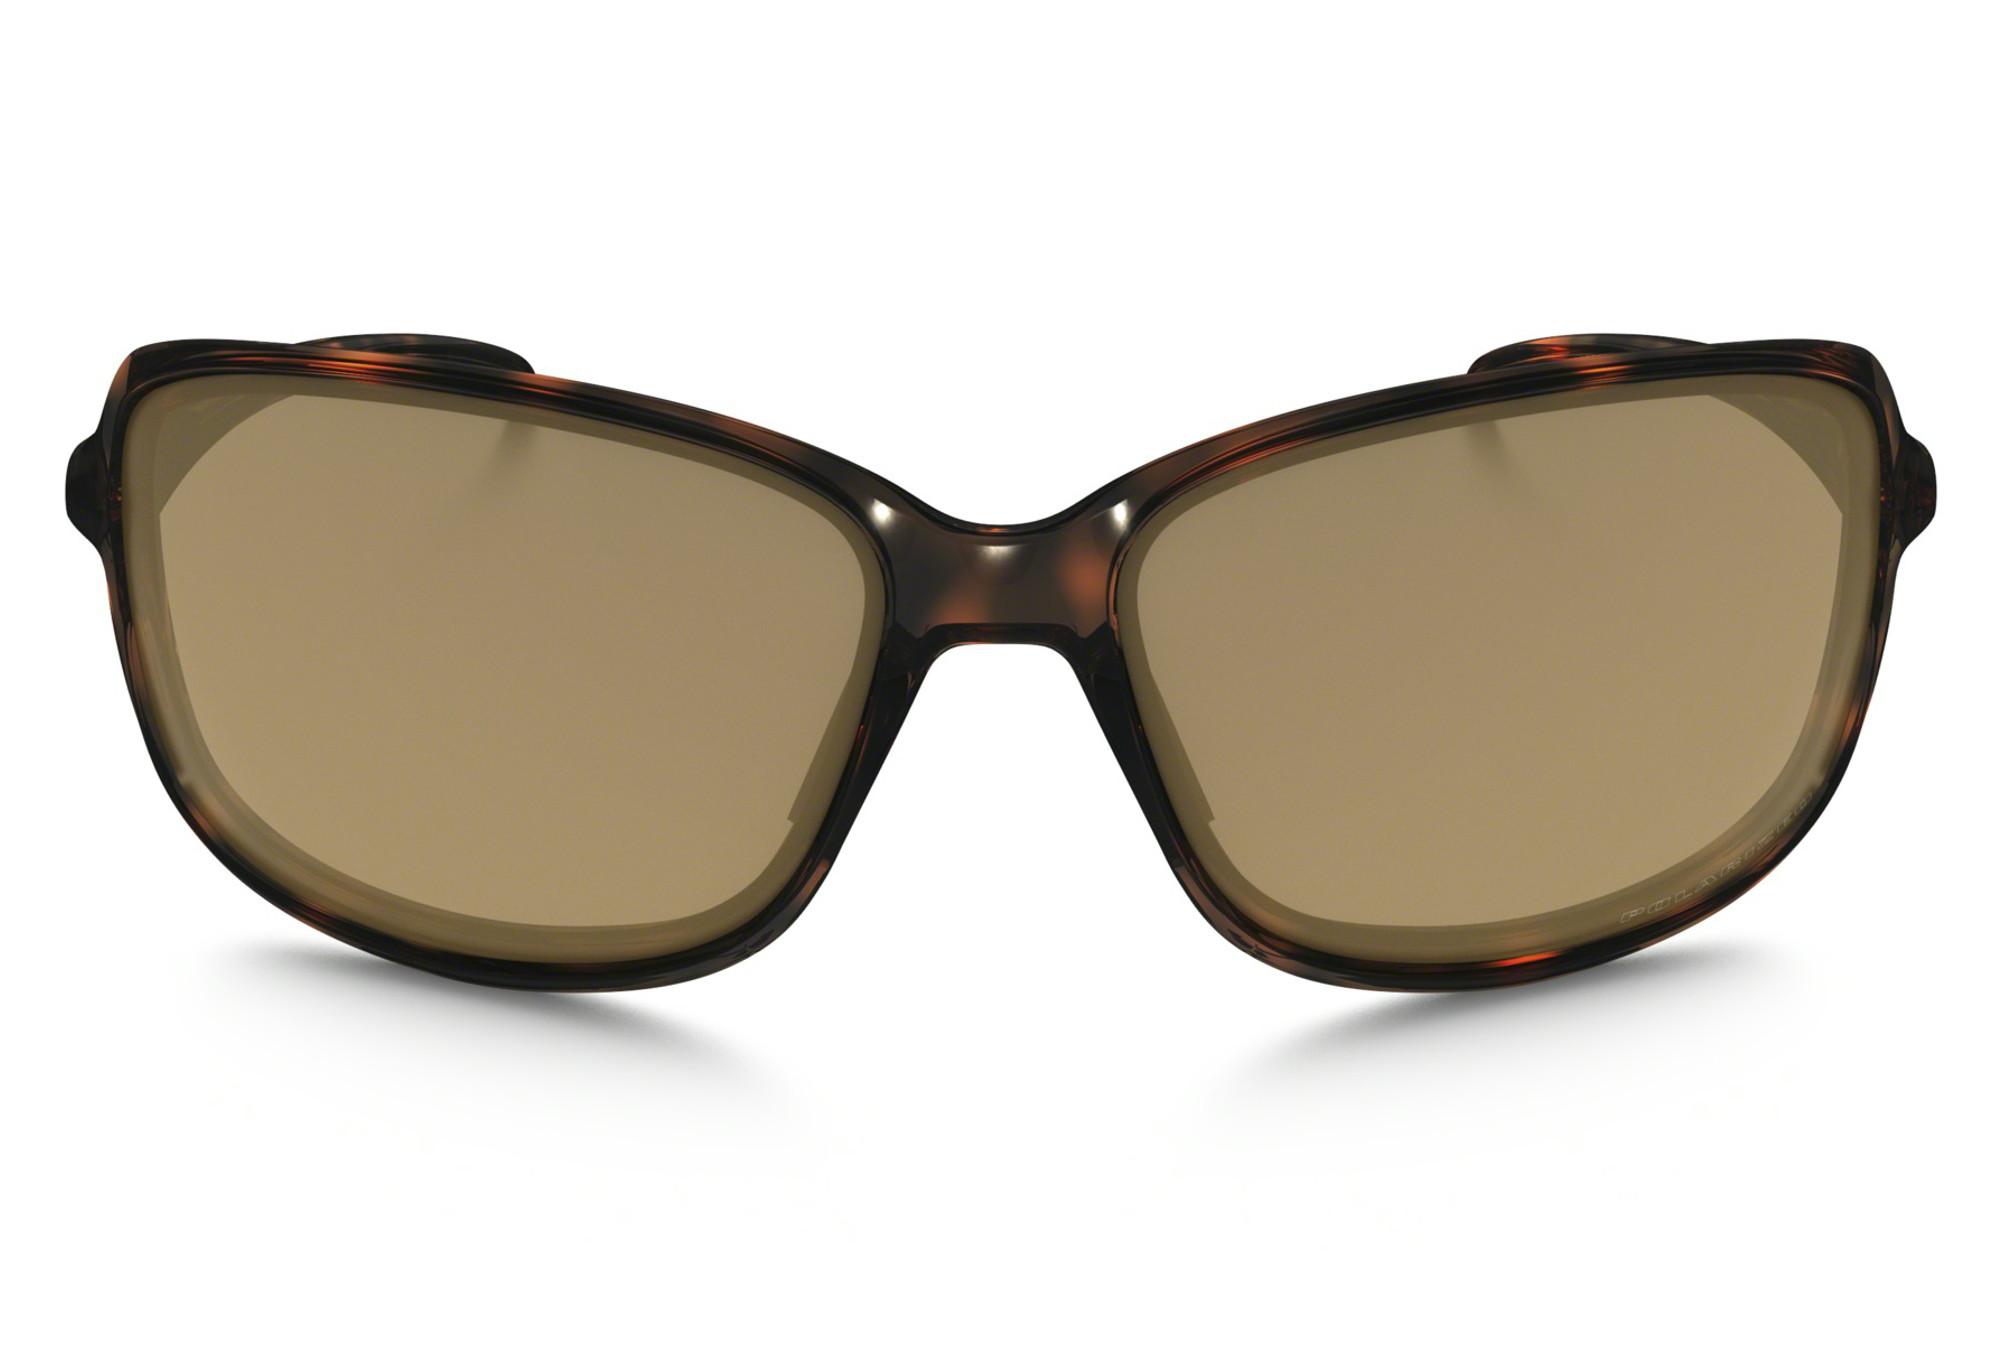 54556872c0e Oakley Polarized Cohort Sunglasses For Women